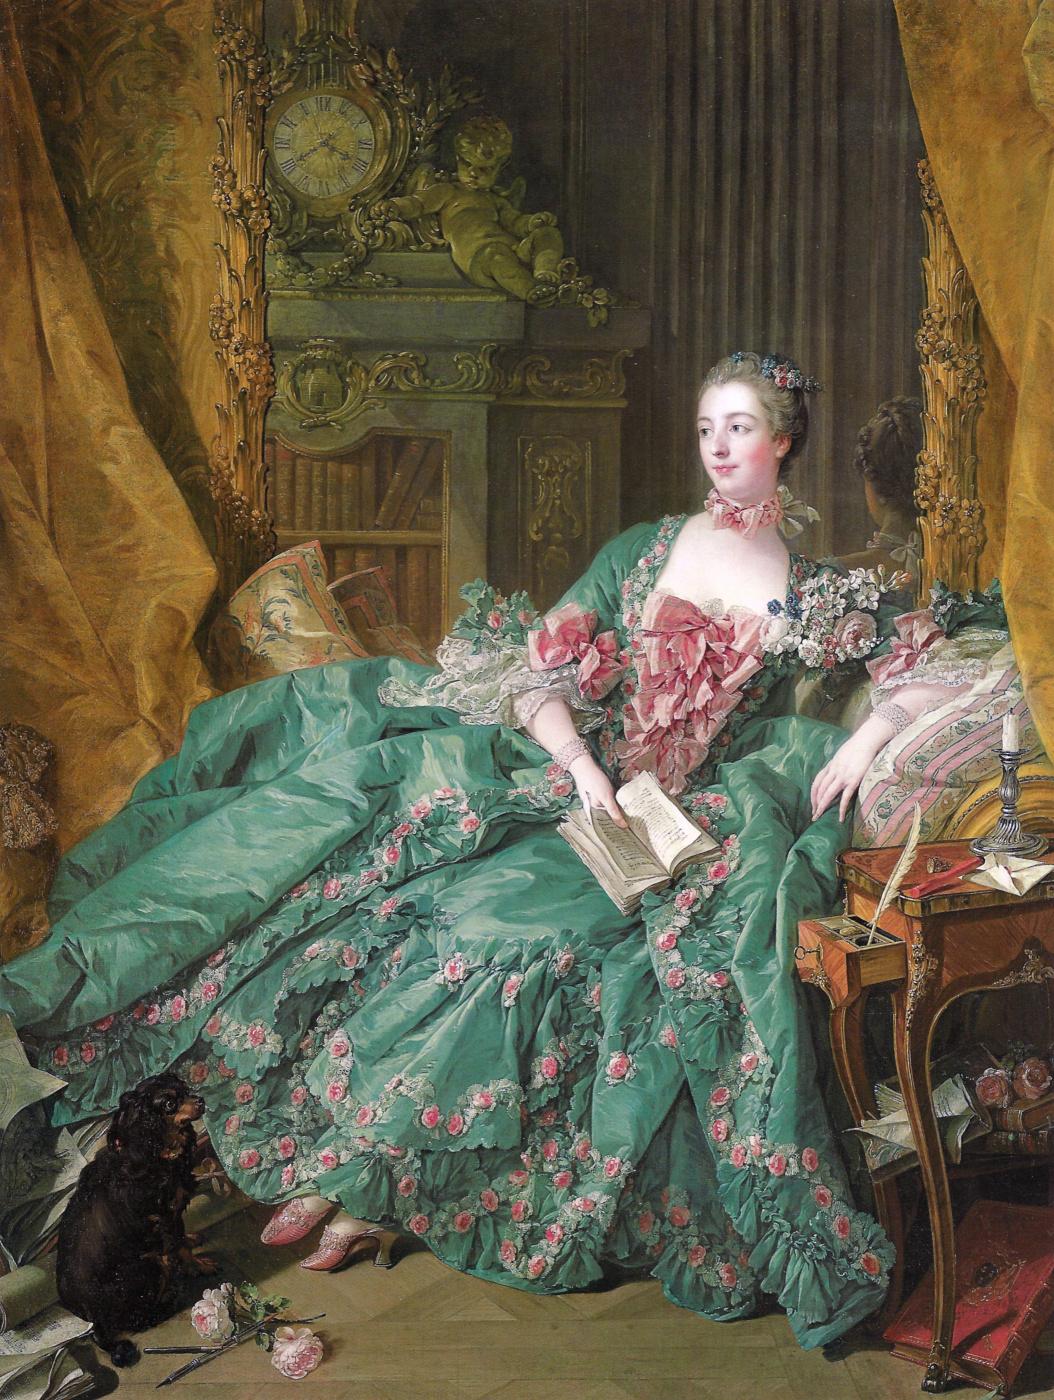 Roxana Golubeva. Francois Boucher - Portrait of Madame de Pompadour